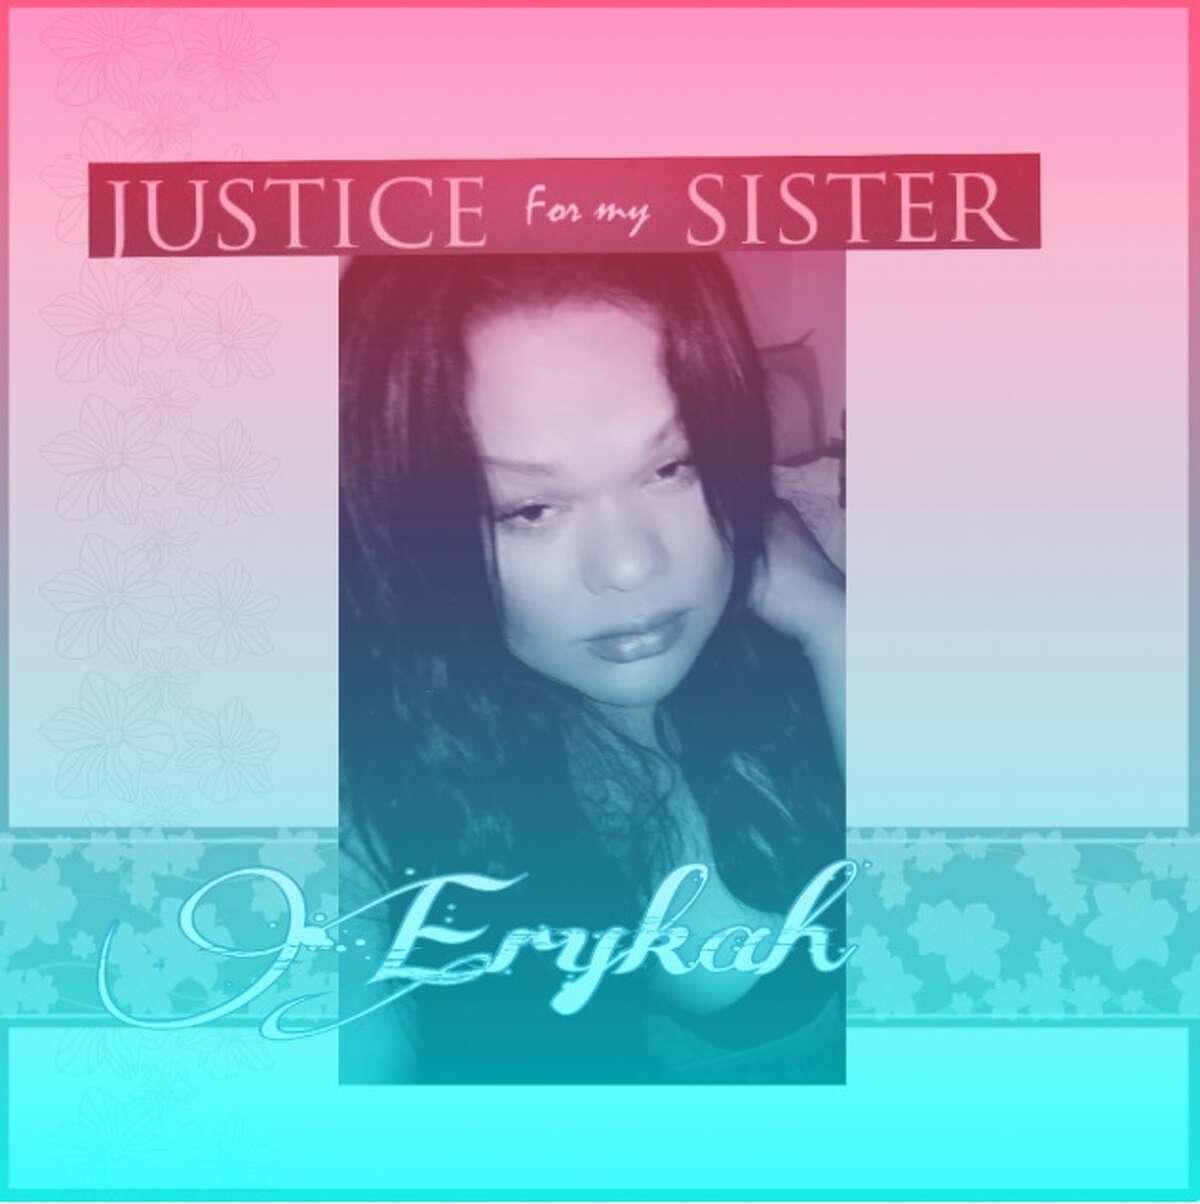 Erykah Tijerina, 36, was found dead Aug. 8, 2016 in El Paso in the 200 block of Lisbon.